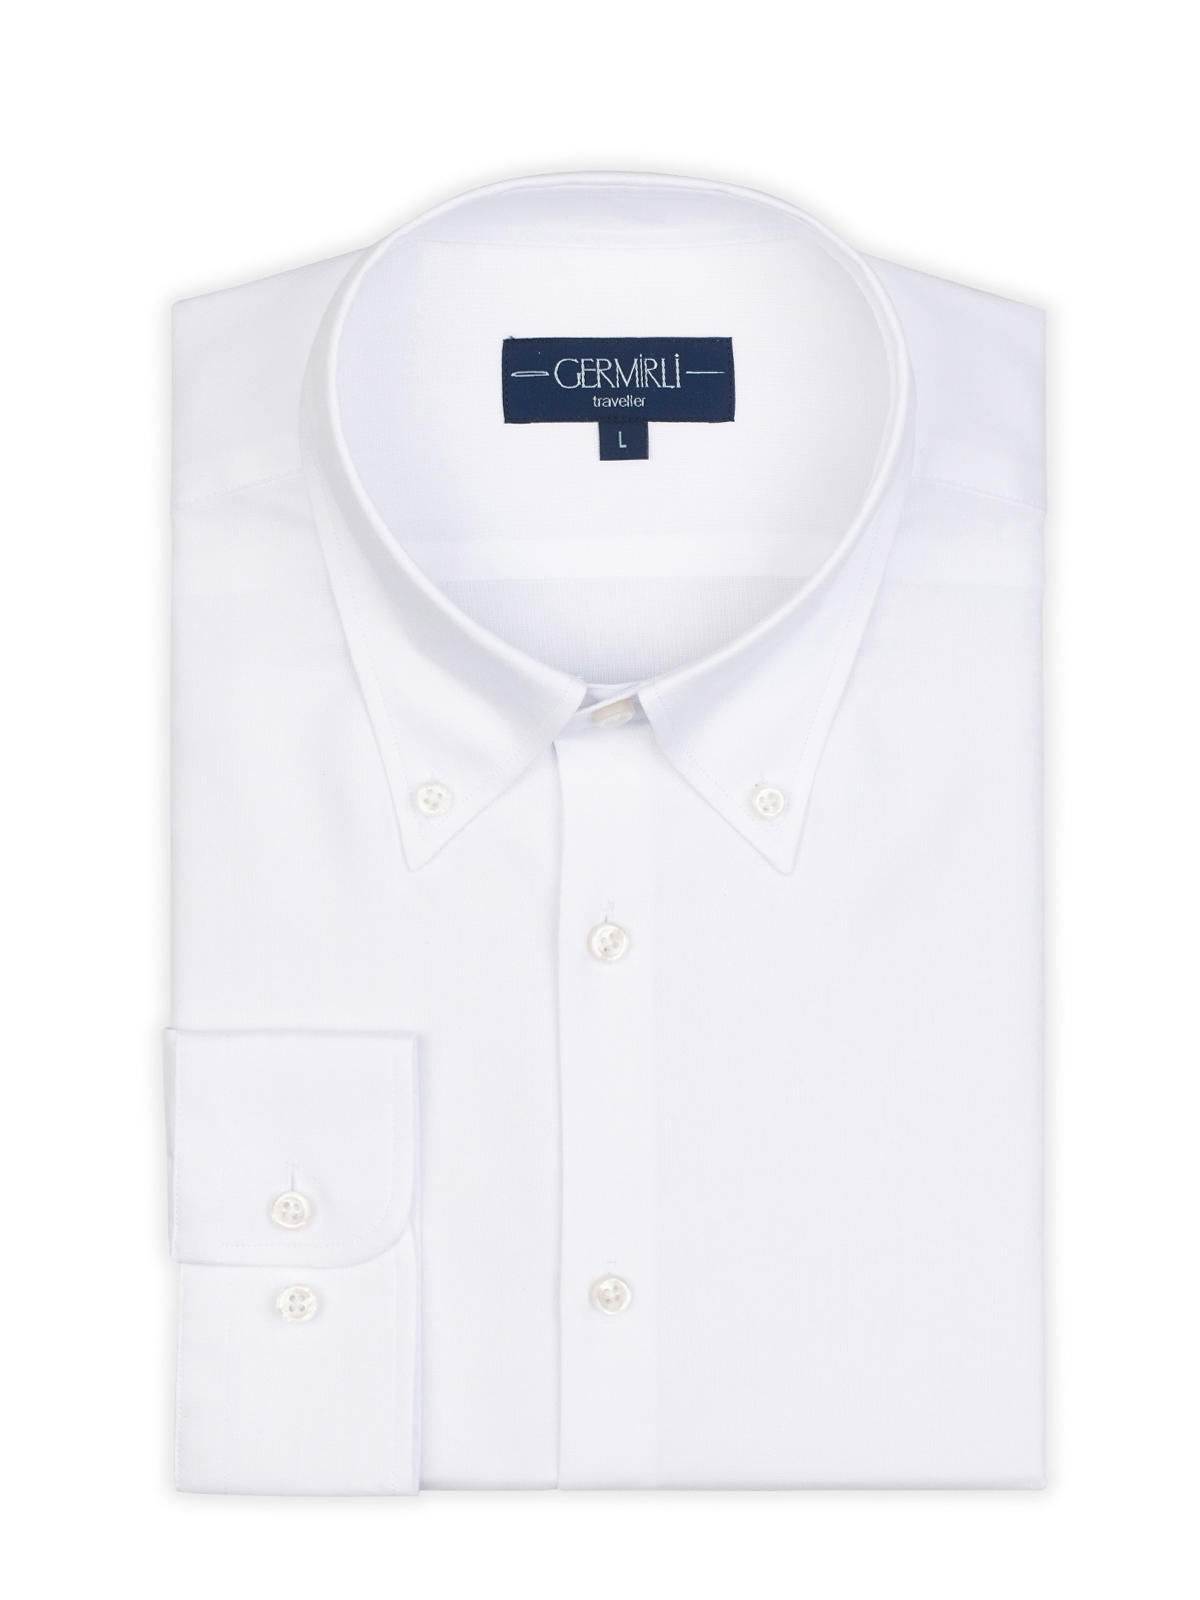 Germirli Non Iron Button Down Collar Tailor Fit Zero 24 Shirt